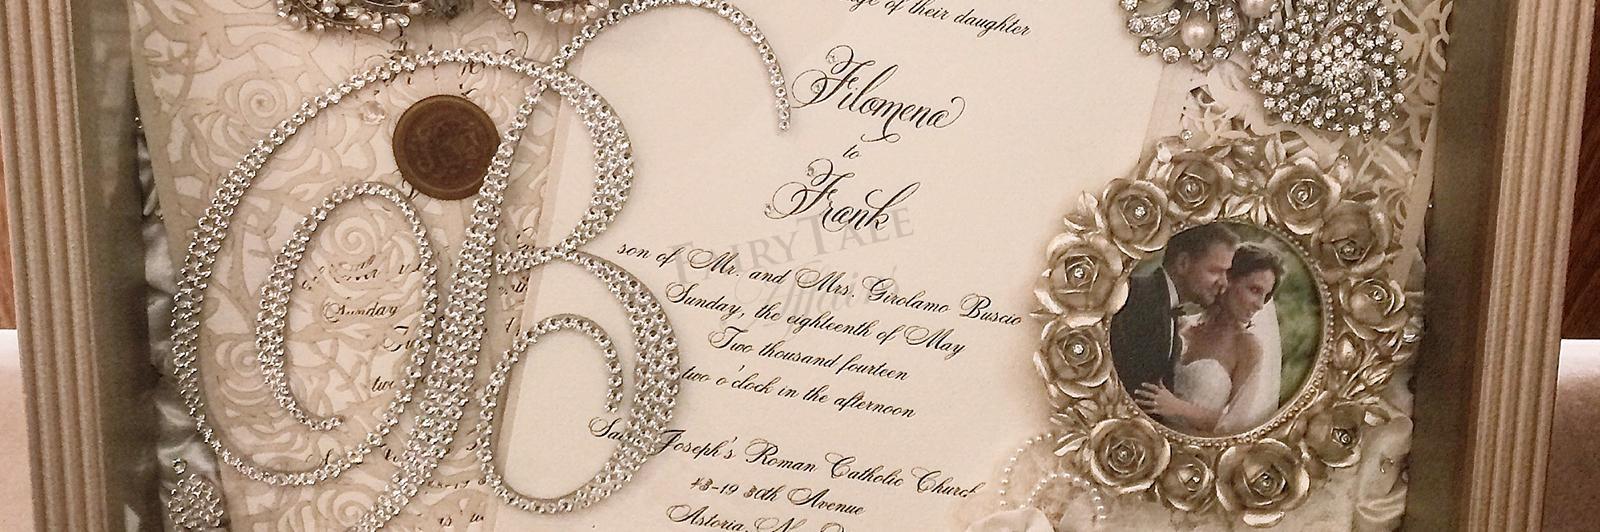 Long Island Wedding Favors